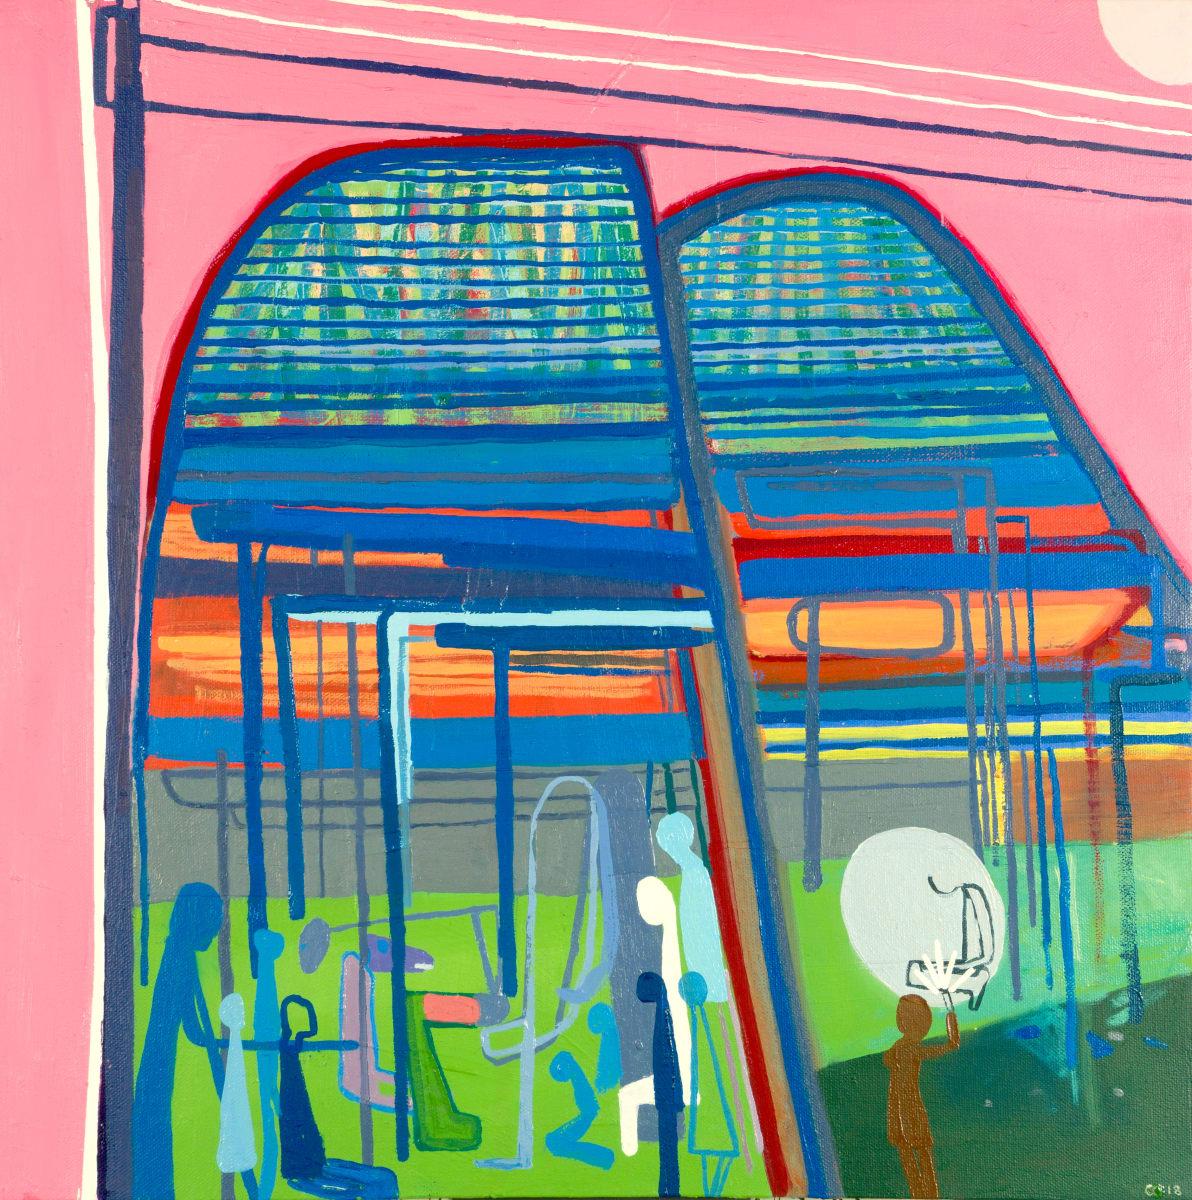 Sunday (2018) by Caley O'Dwyer